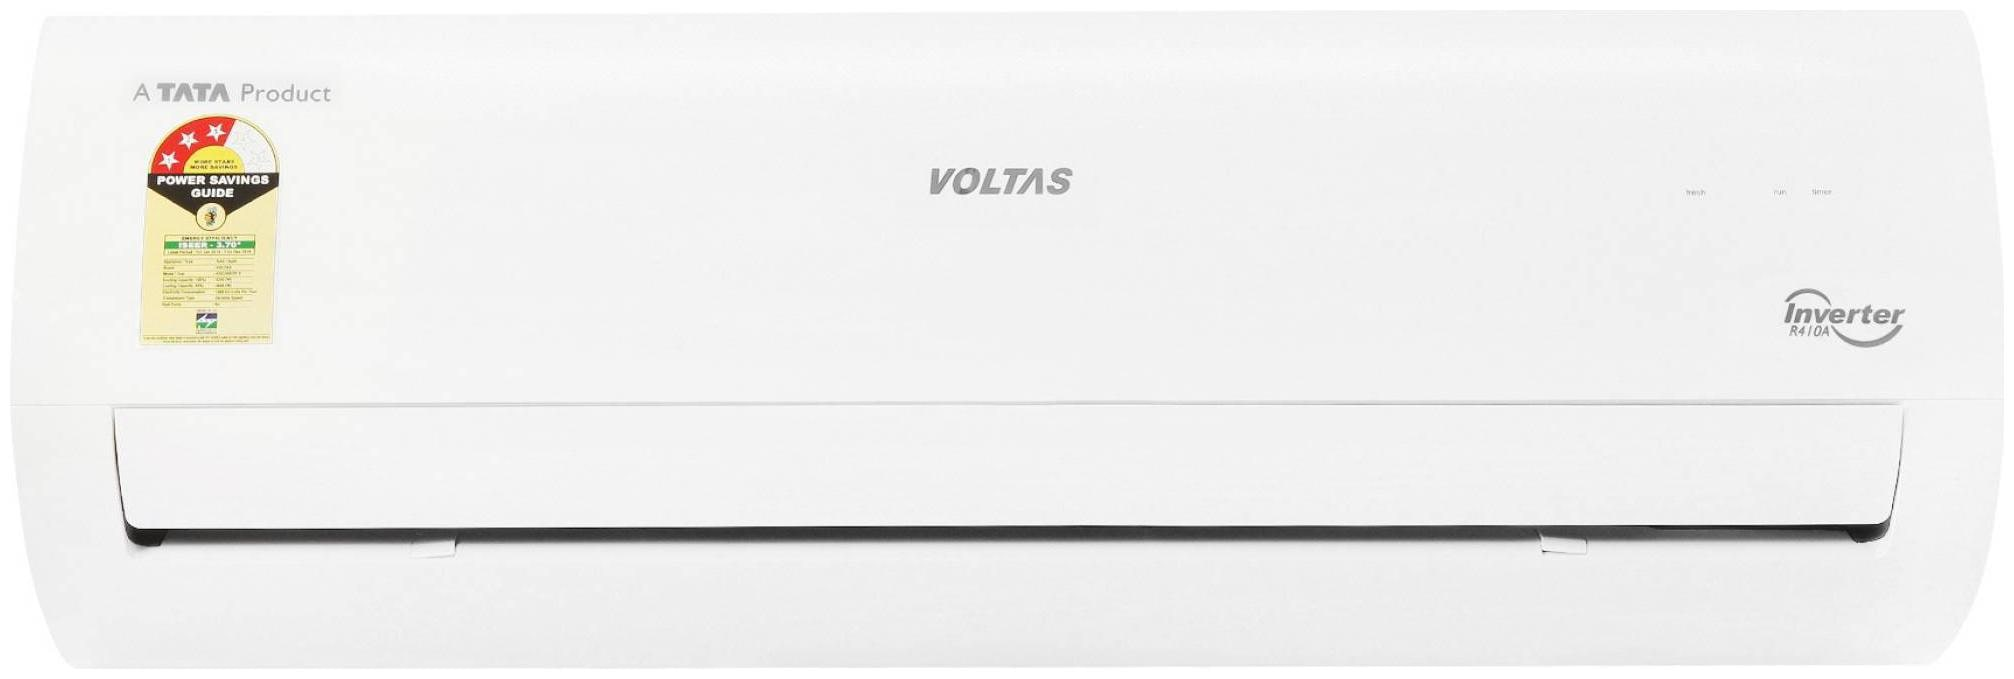 Voltas 1.5 Ton 3 star bee rating Inverter Split ac , 183VCZT3 , White   by Best Home Retail